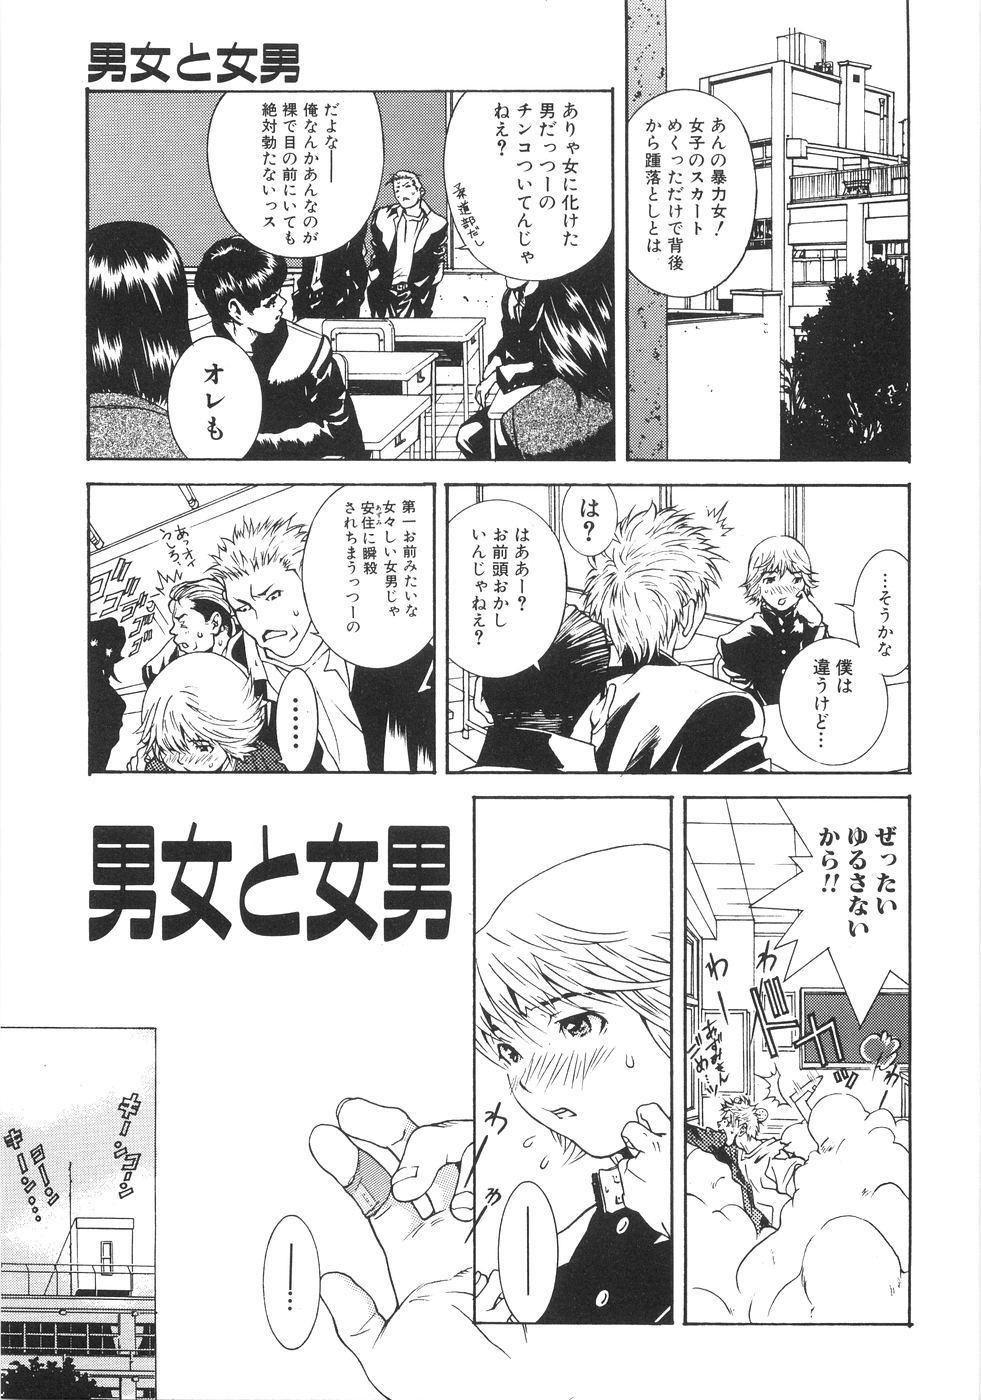 Honki Jiru - Cowper's Gland Liquid? or Love Juice?...?! 123